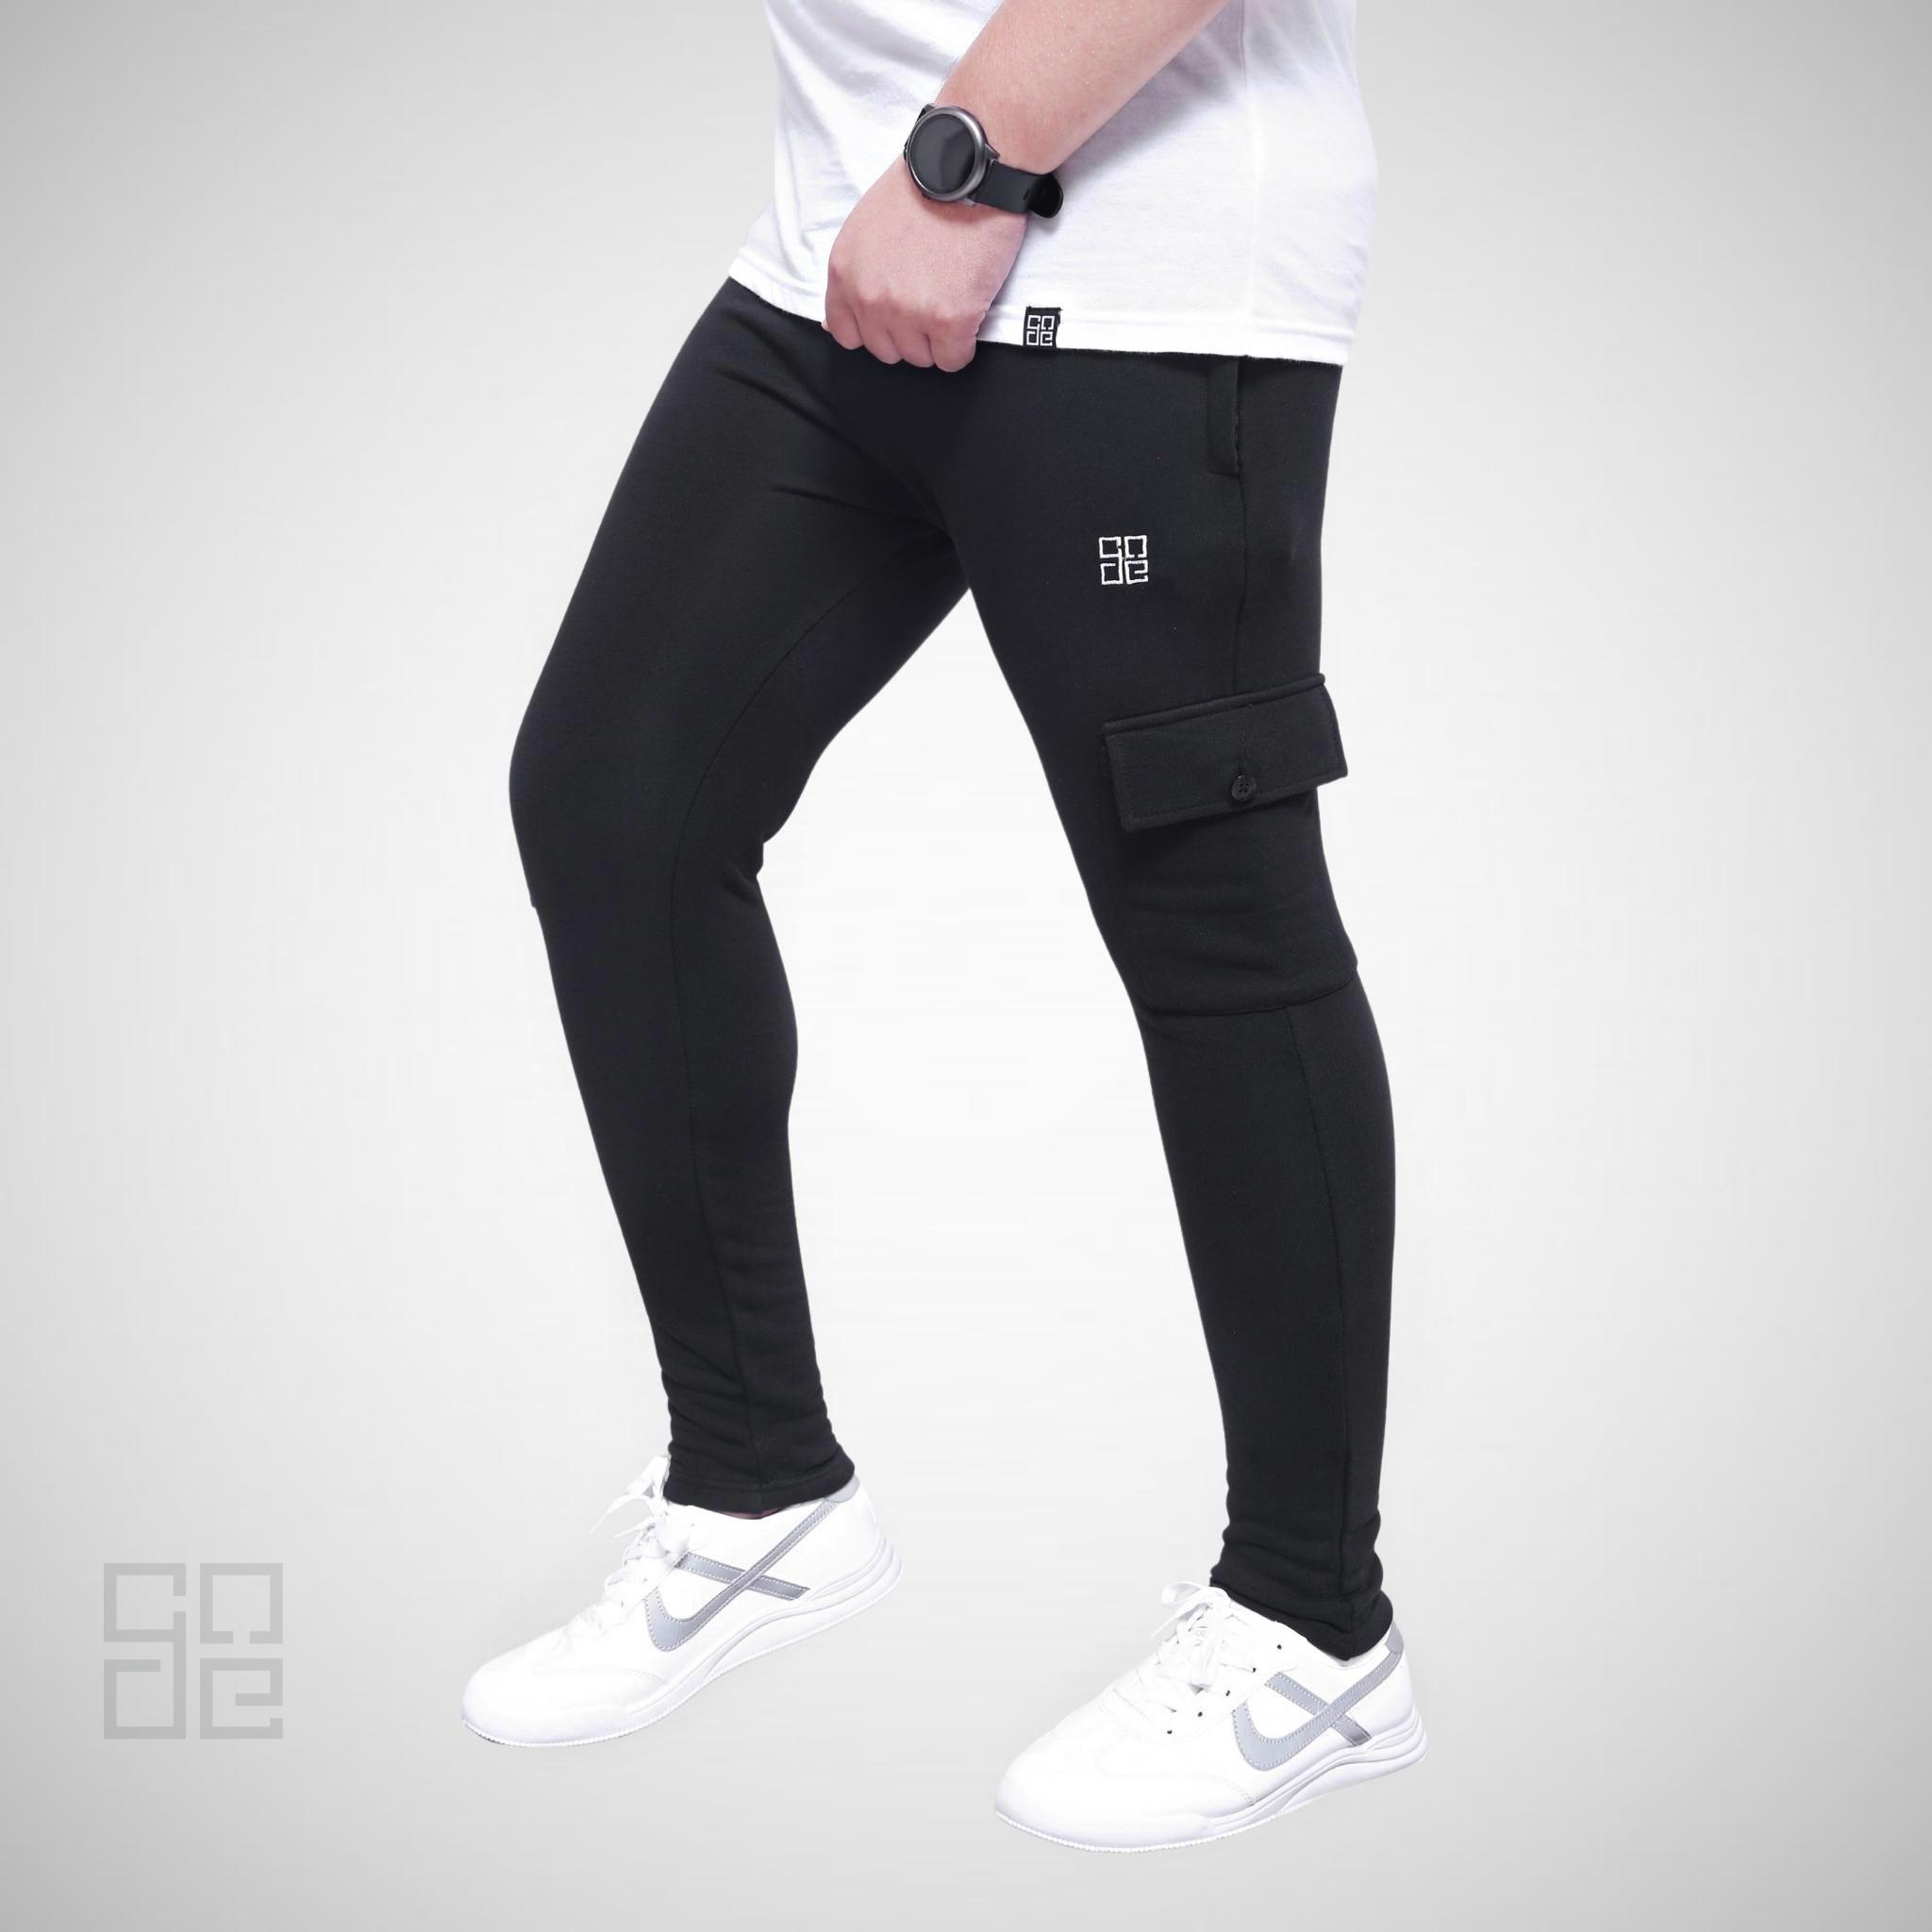 Winter Trouser For Men Black Cargo Style French Terry Trouser